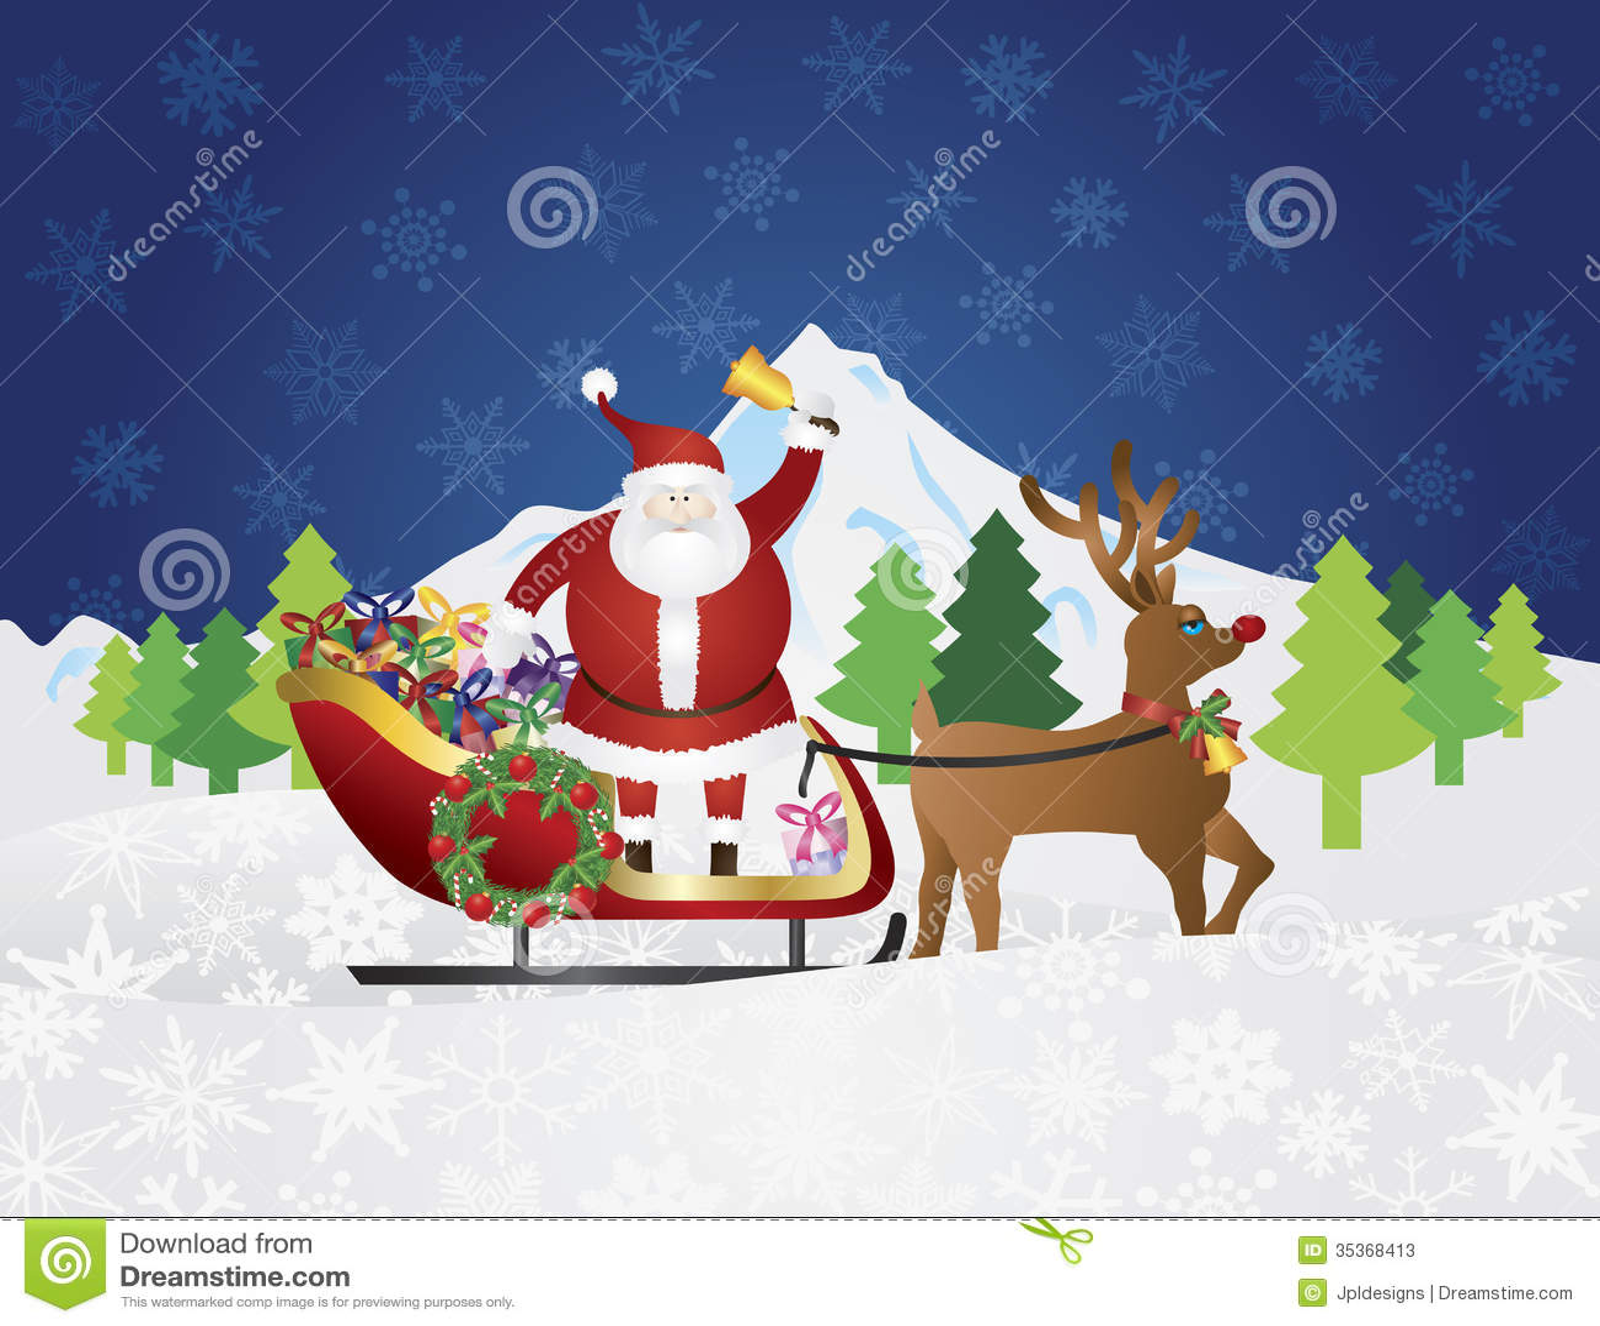 santa claus on a reindeer sleigh in christmas in night scene stock